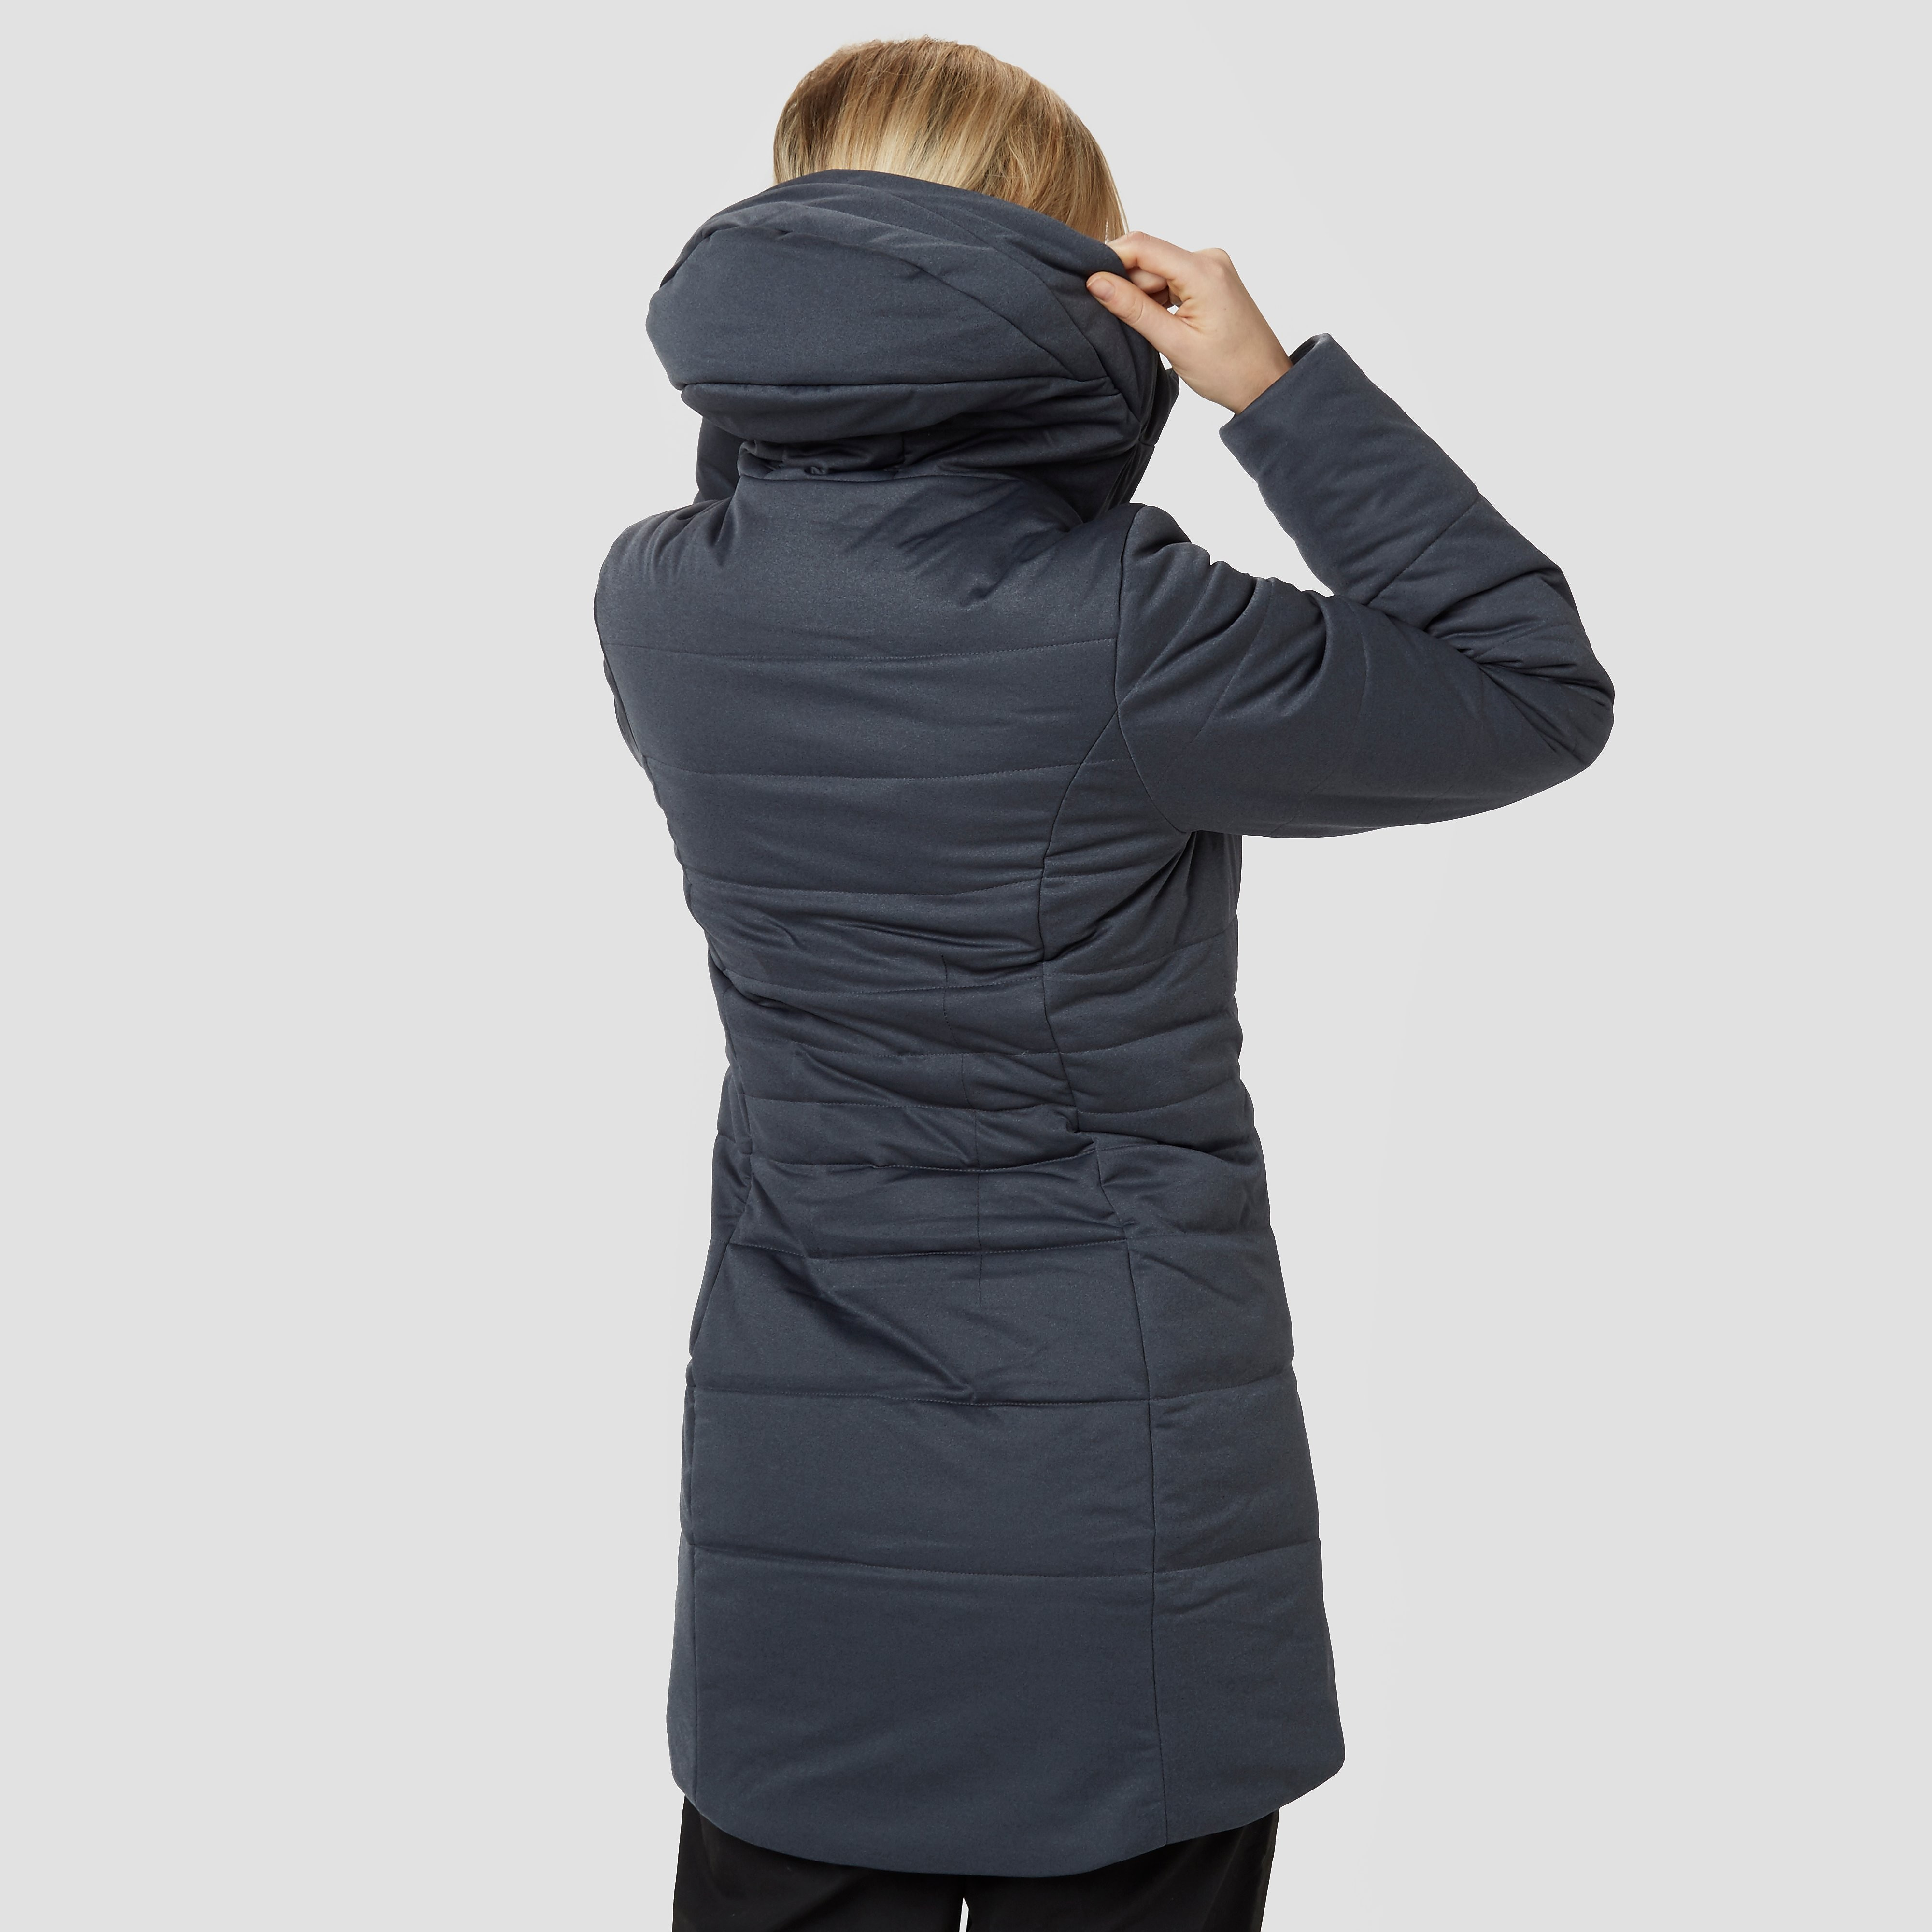 BERGHAUS Women's Hatfield Insulated Jacket